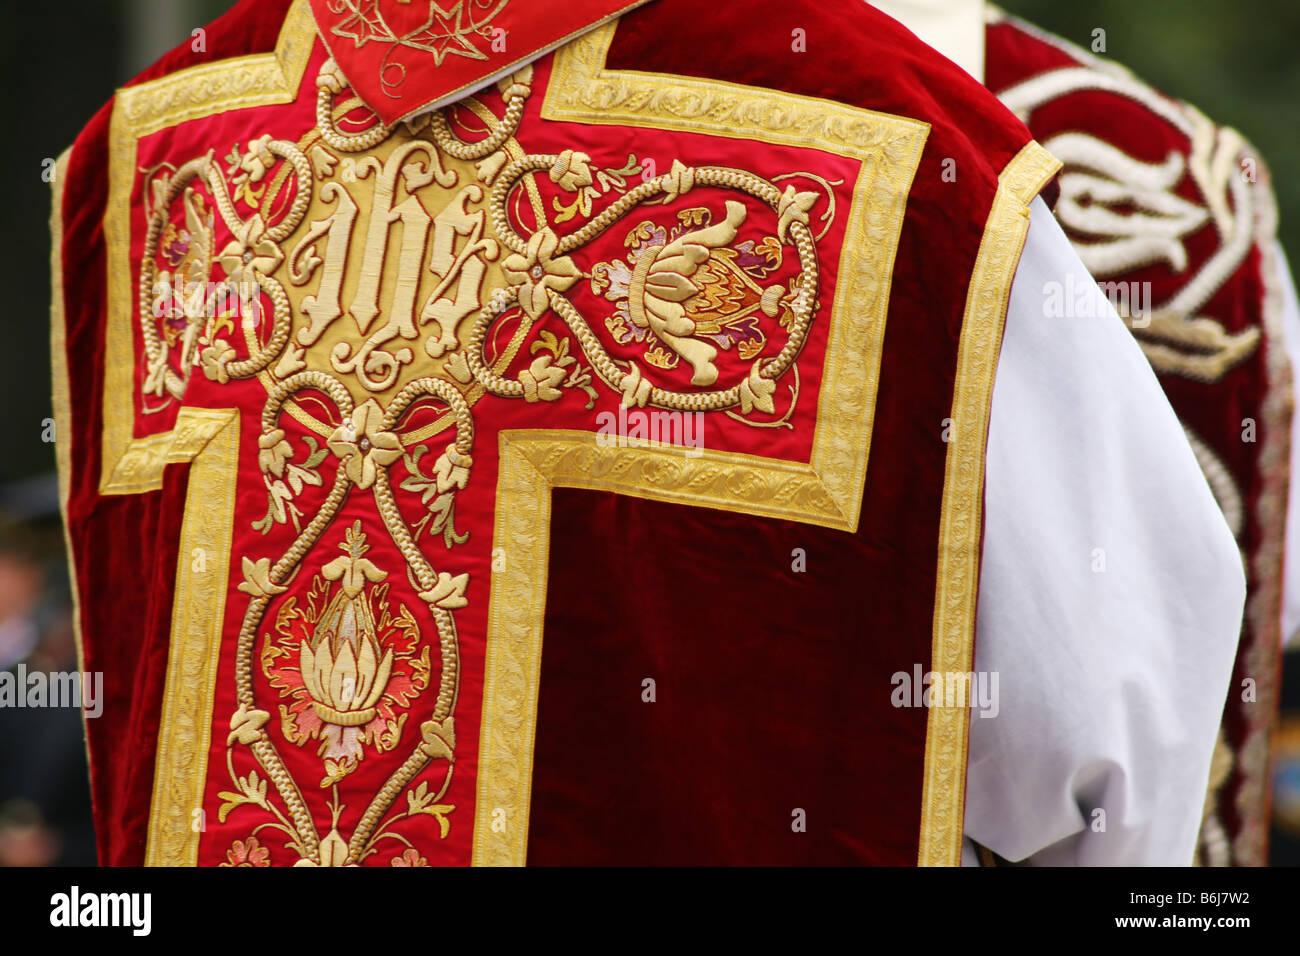 Ecclesiastical garment - Stock Image